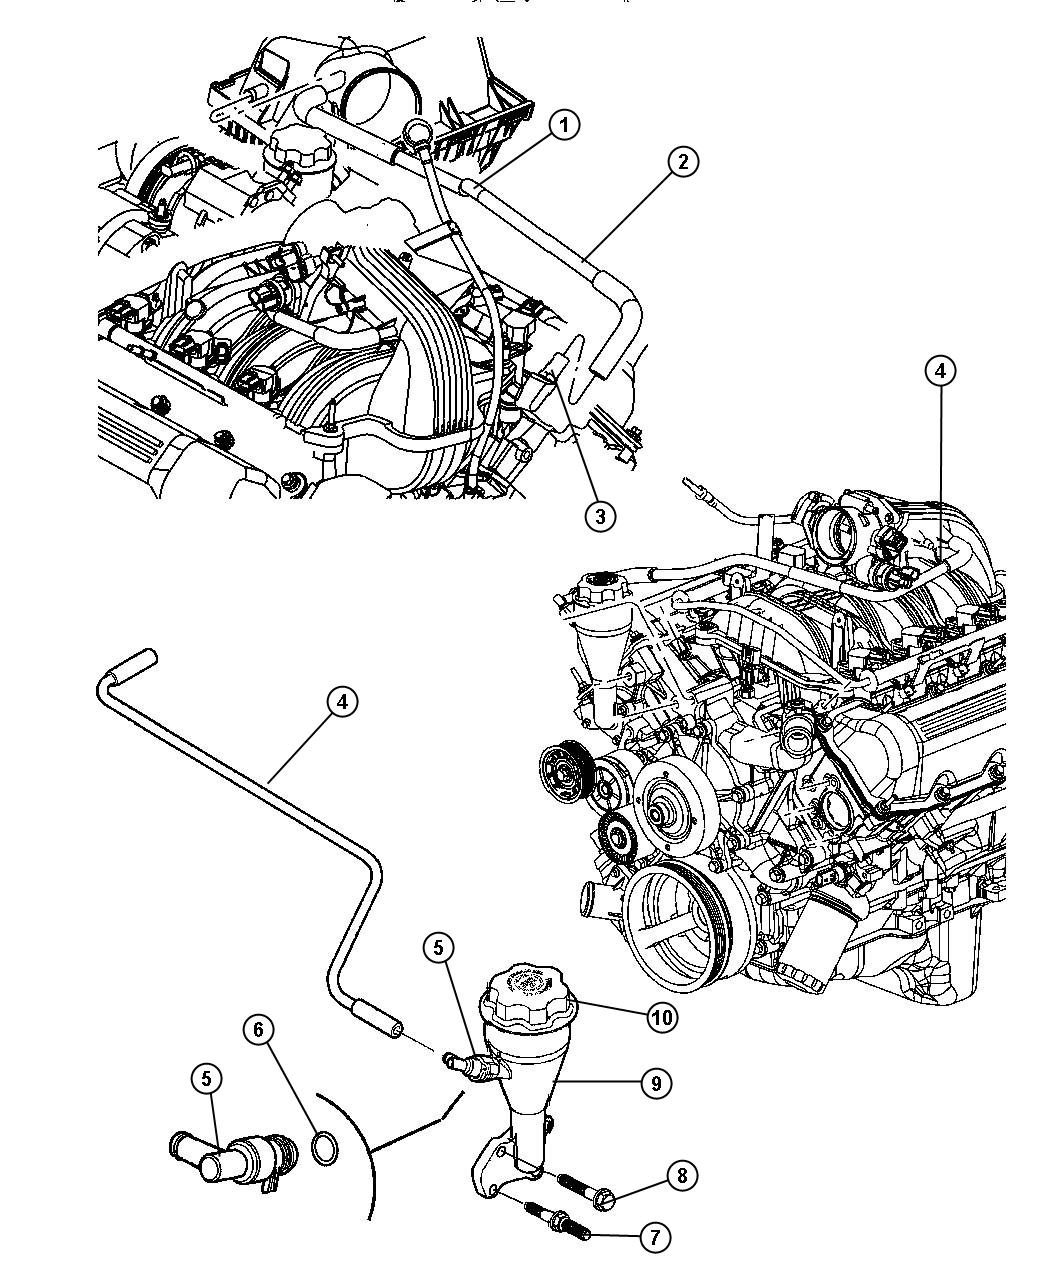 Dodge durango pcv valve location 2007 dodge nitro engine spark plug diagram at ww